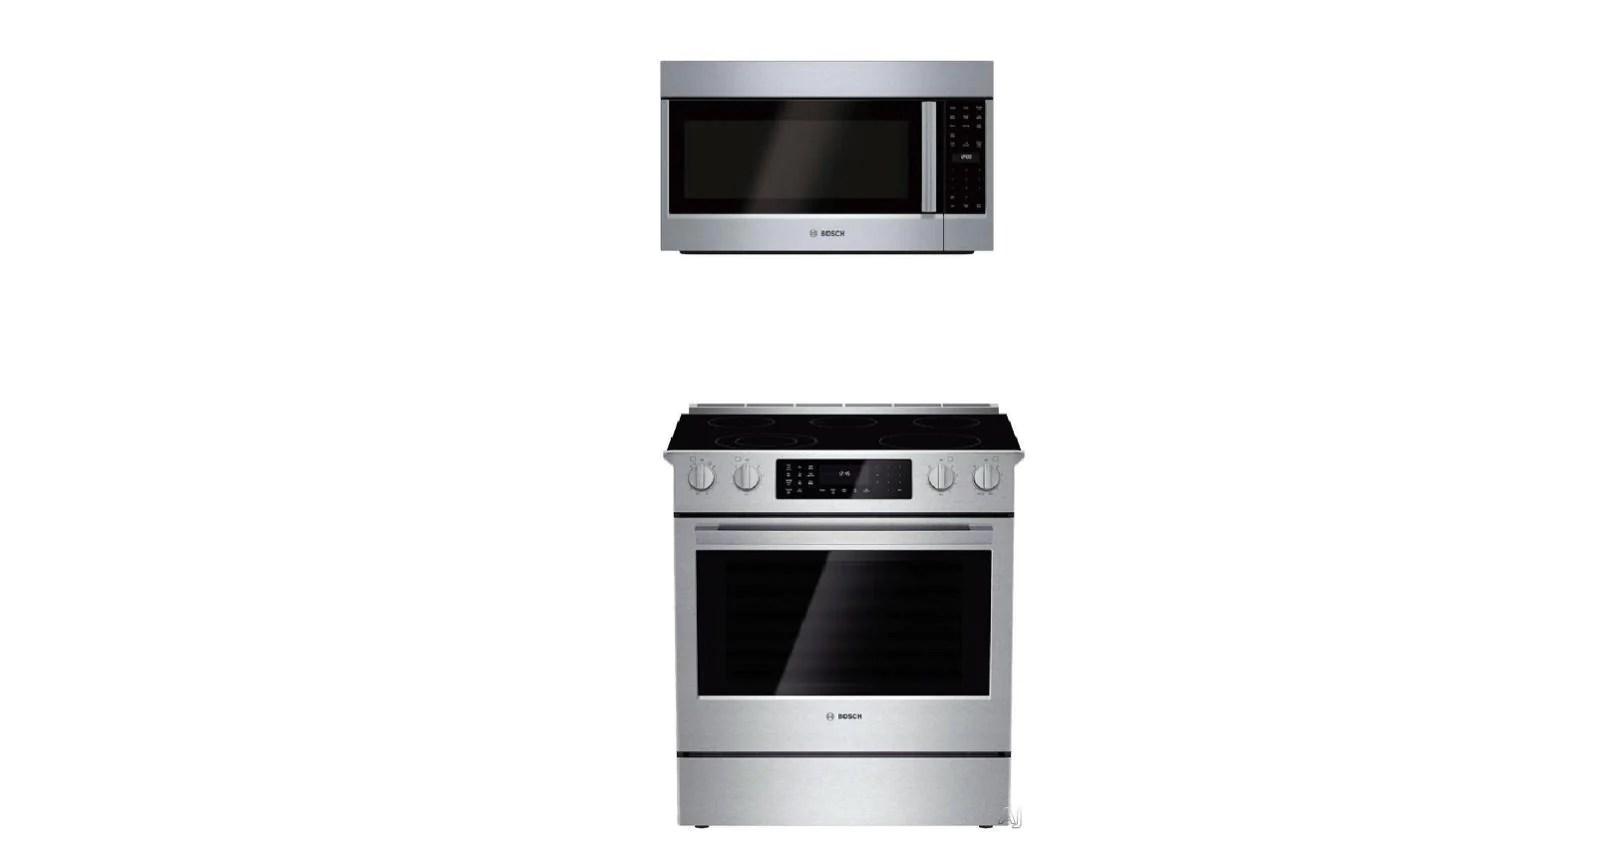 bosch 800 30 slide in electric range hei8054u microwave oven hmv5053u combo